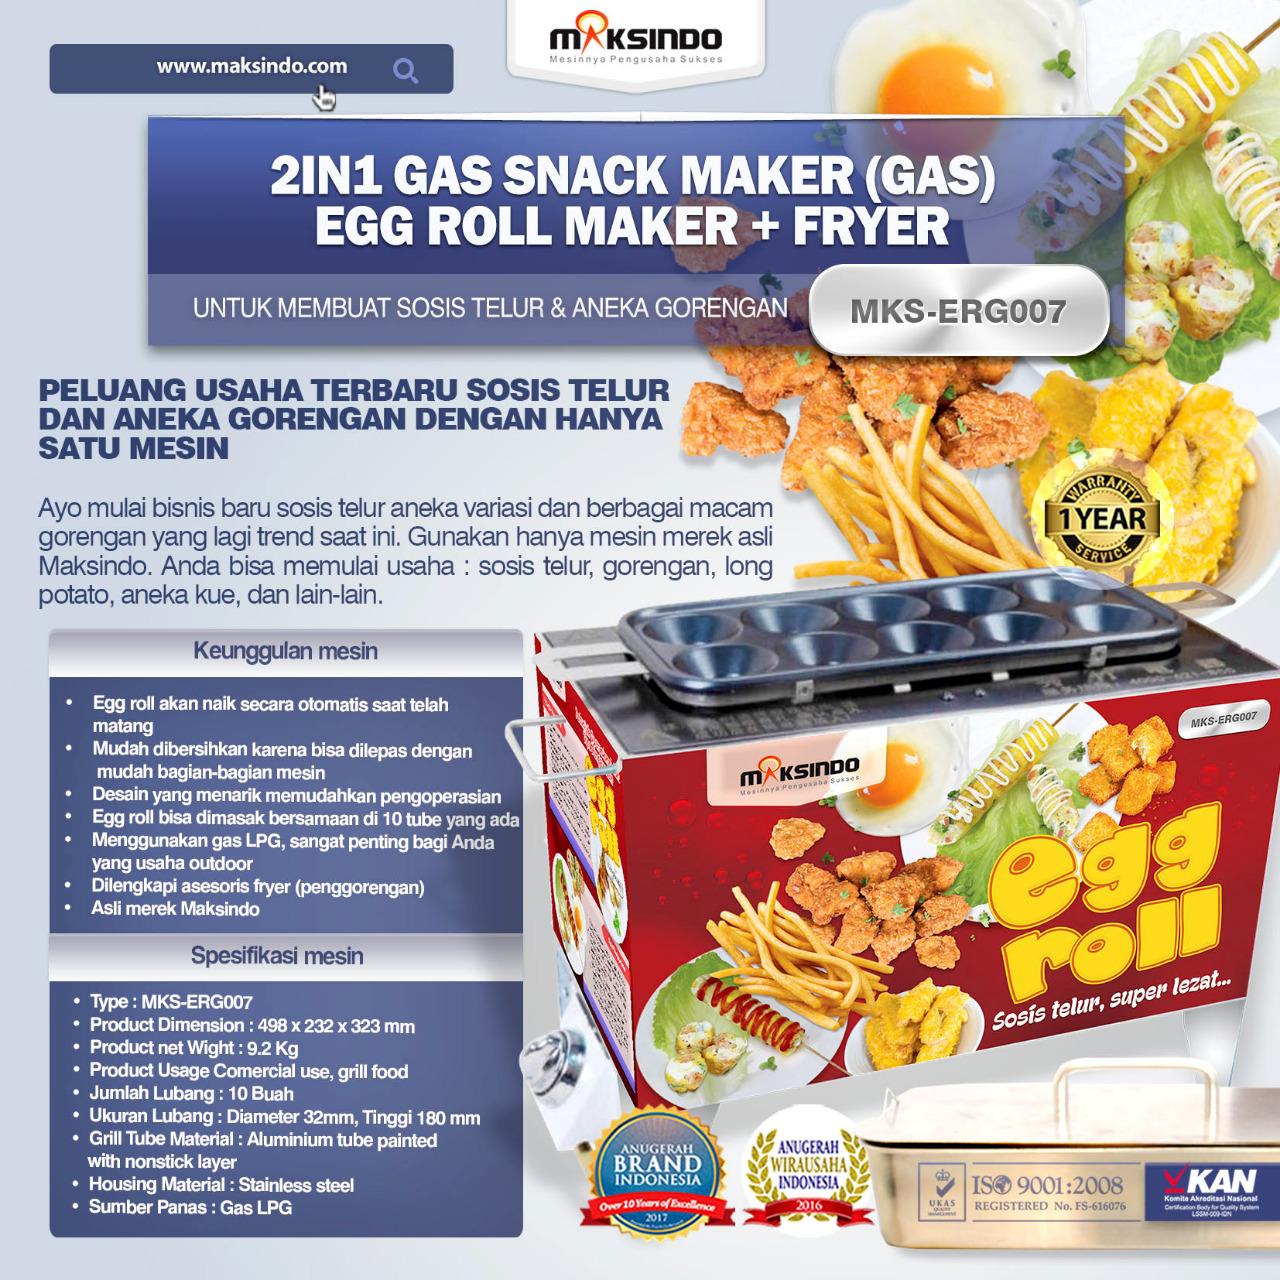 mesin-sostel-sosis-telur-gas-maksindo-terbaru-erg007